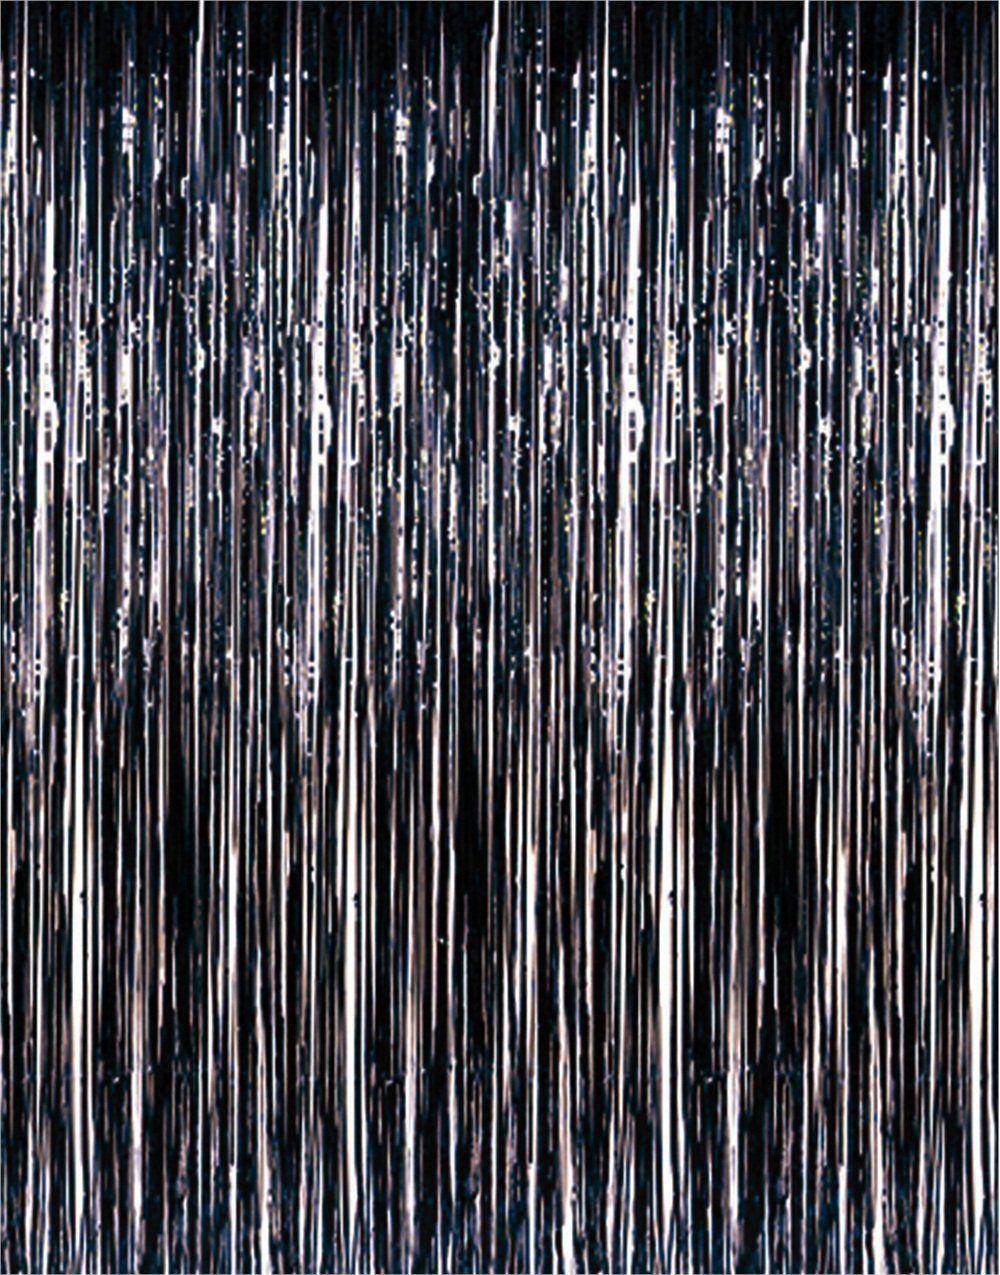 Details About Metallic Black Tinsel Foil Fringe Curtain Photo